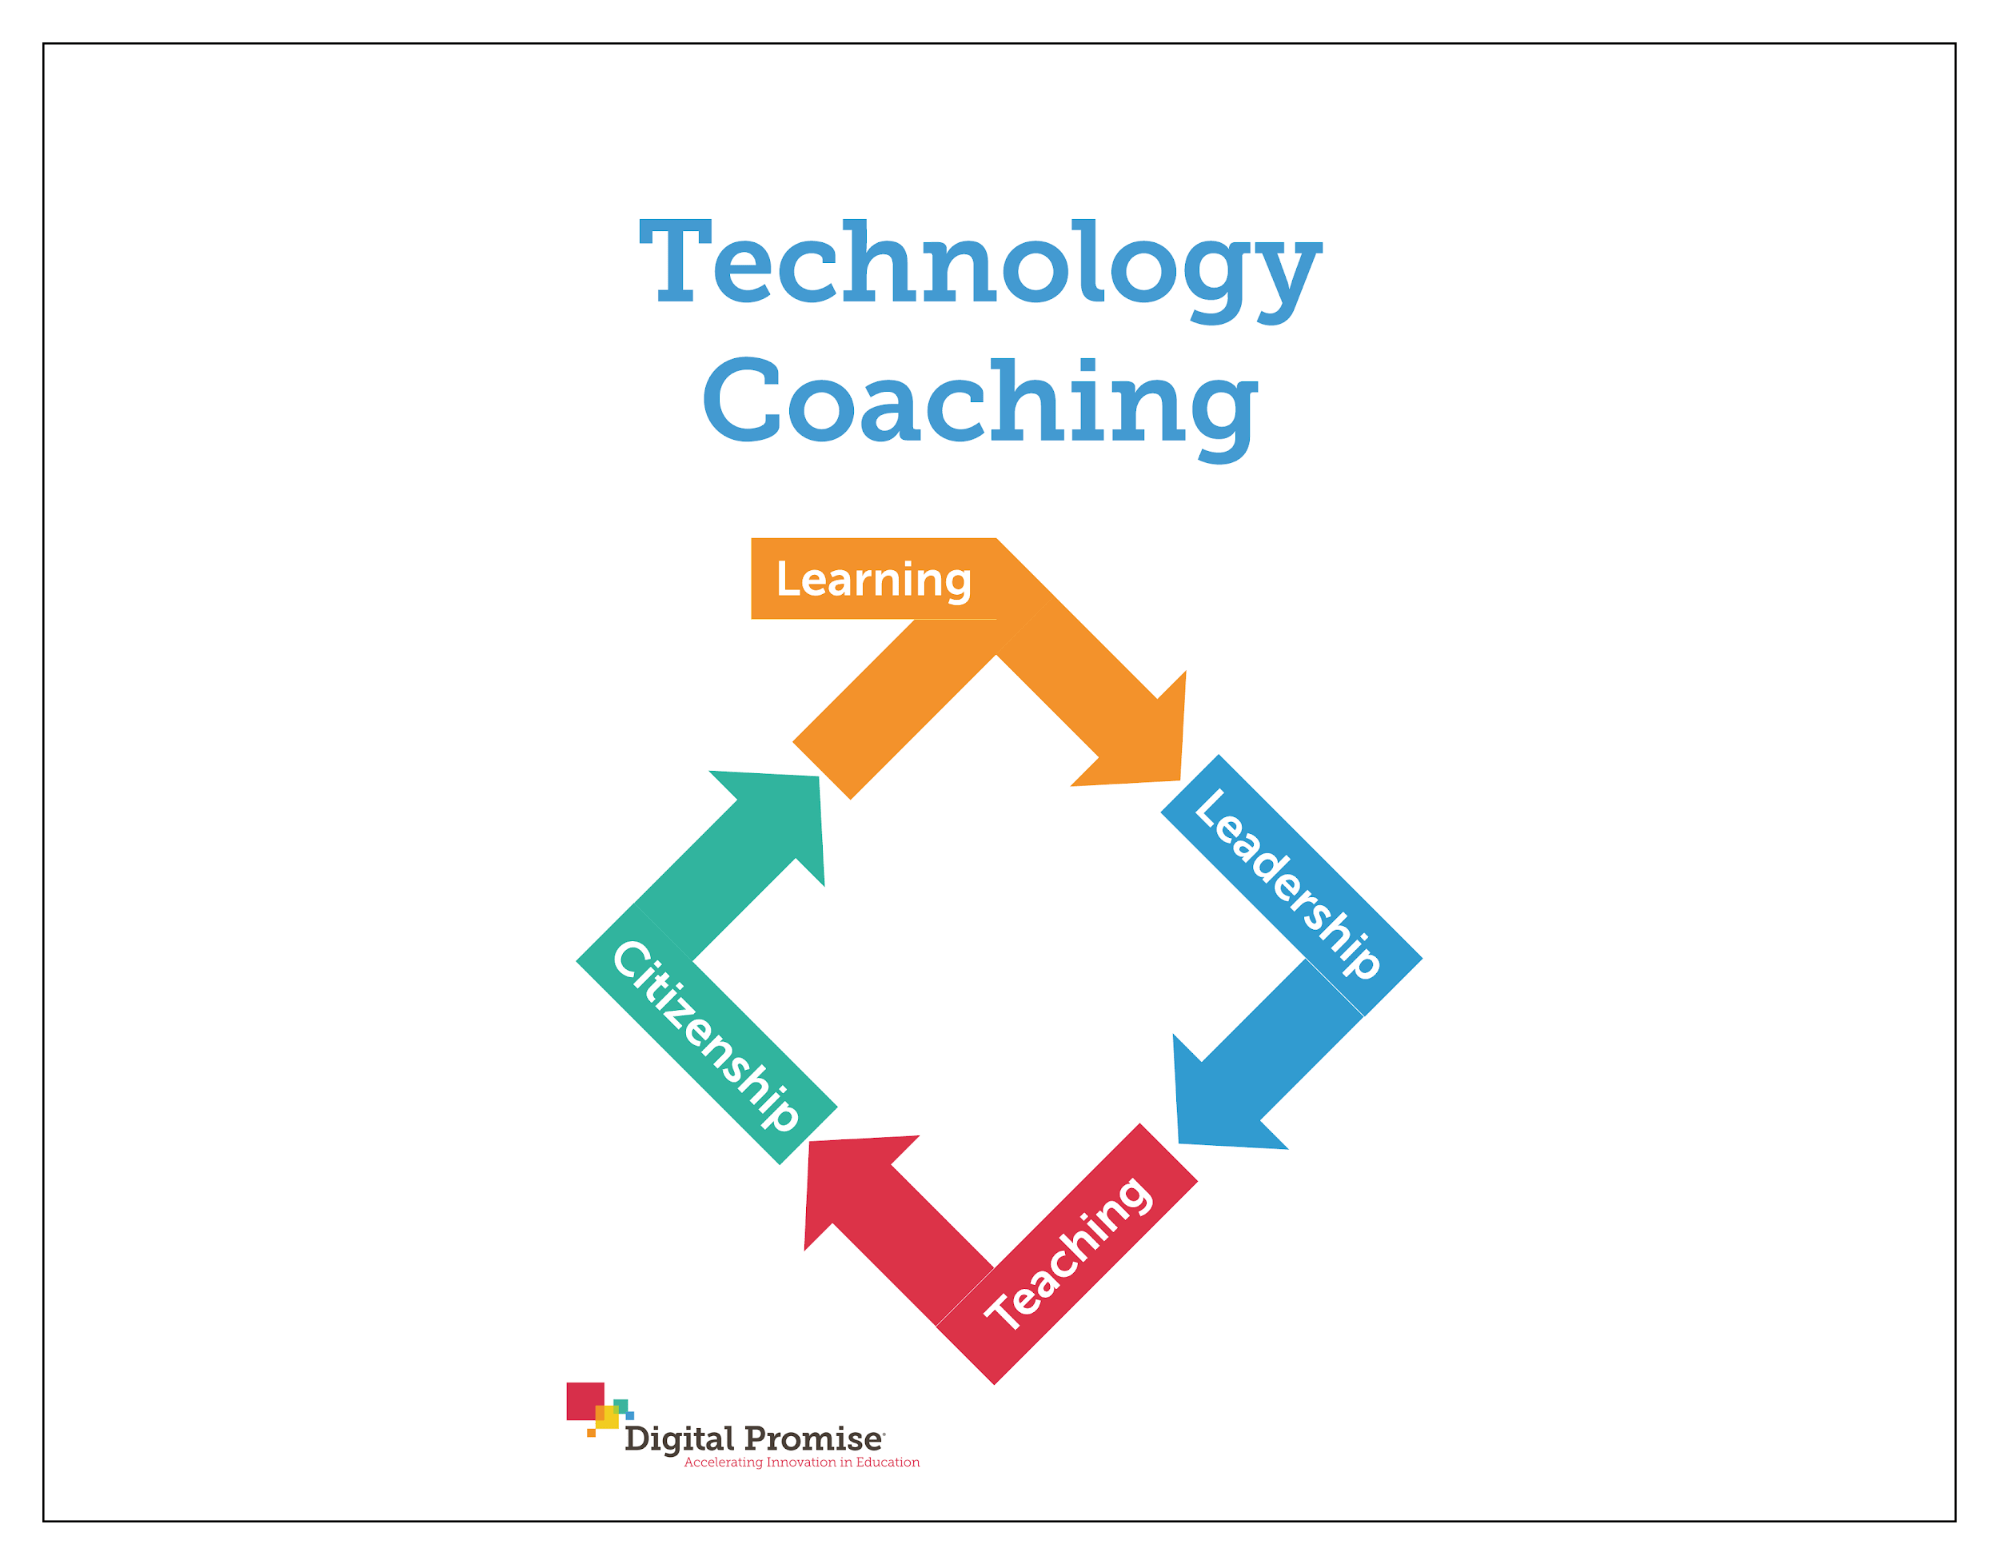 How Instructional Technology Coaching Can Help Teachers